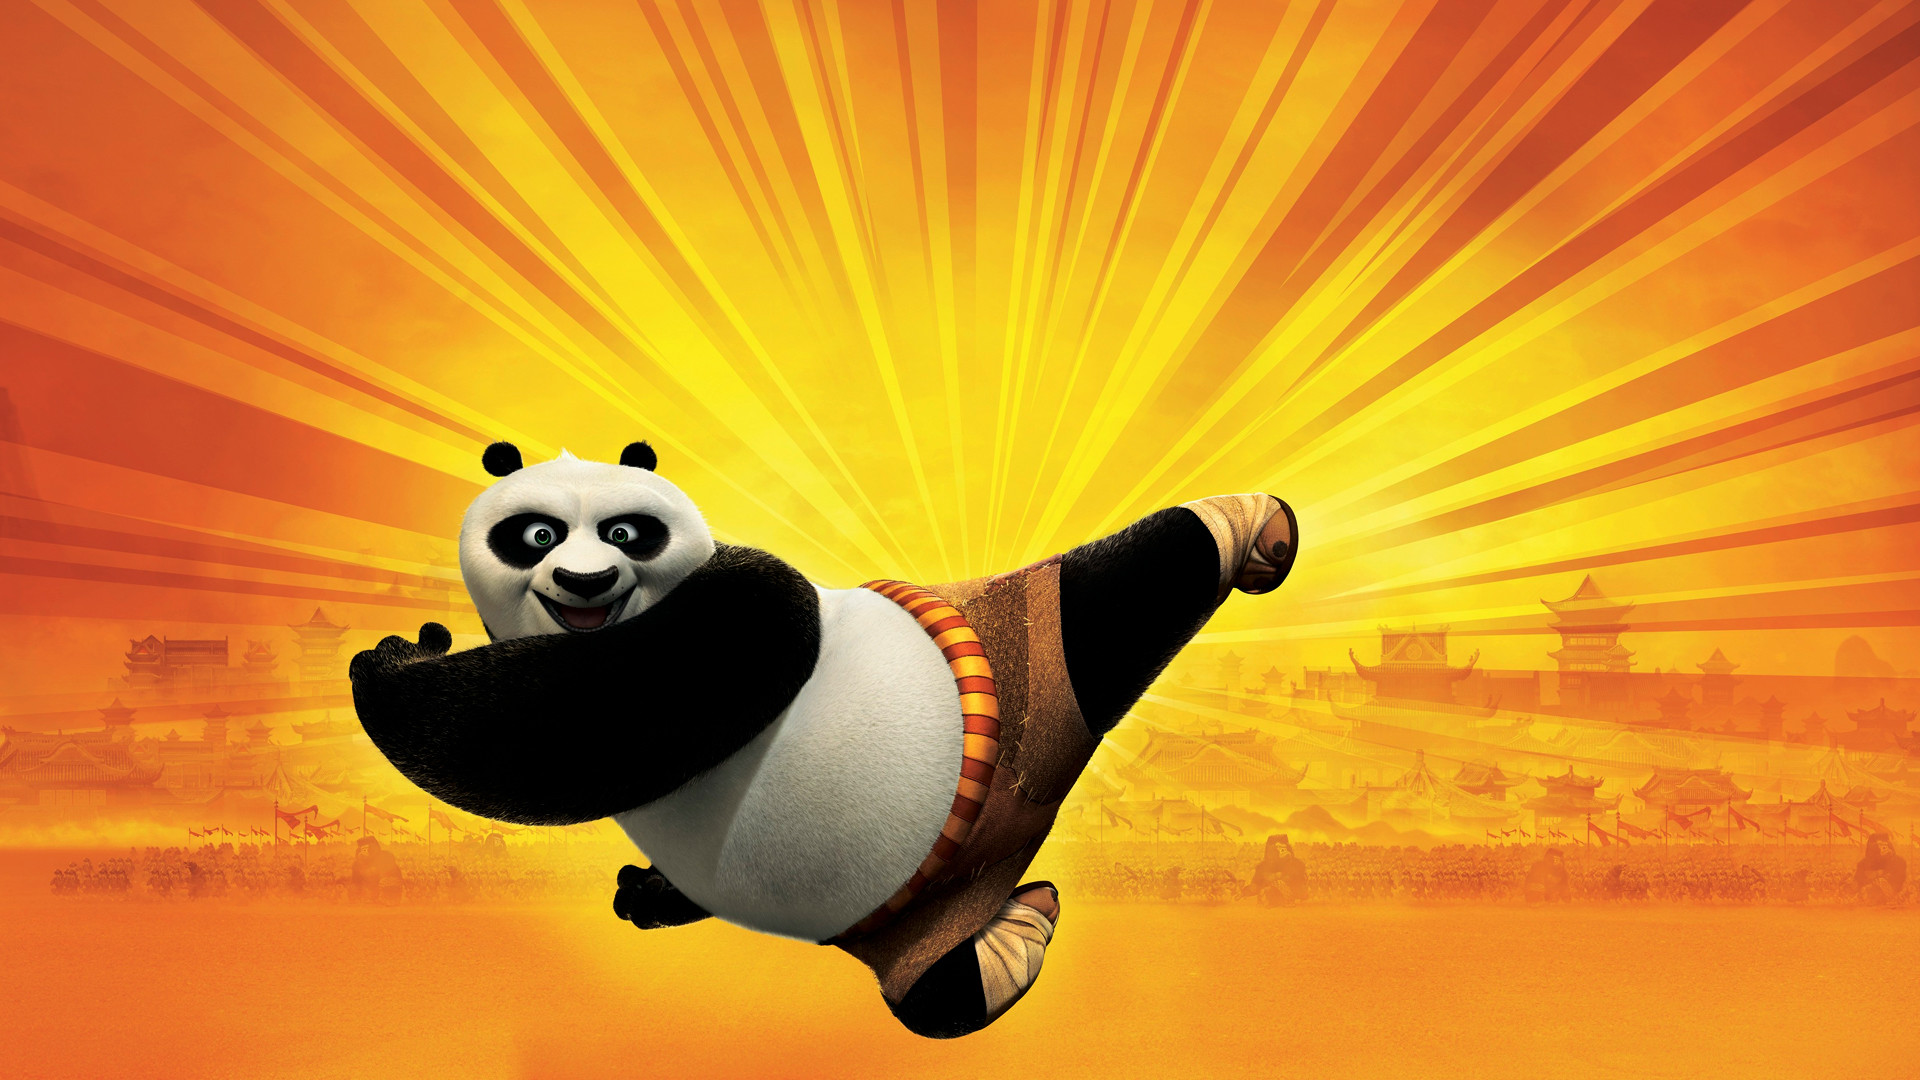 Res: 1920x1080, Kung Fu Panda Wallpaper 15287